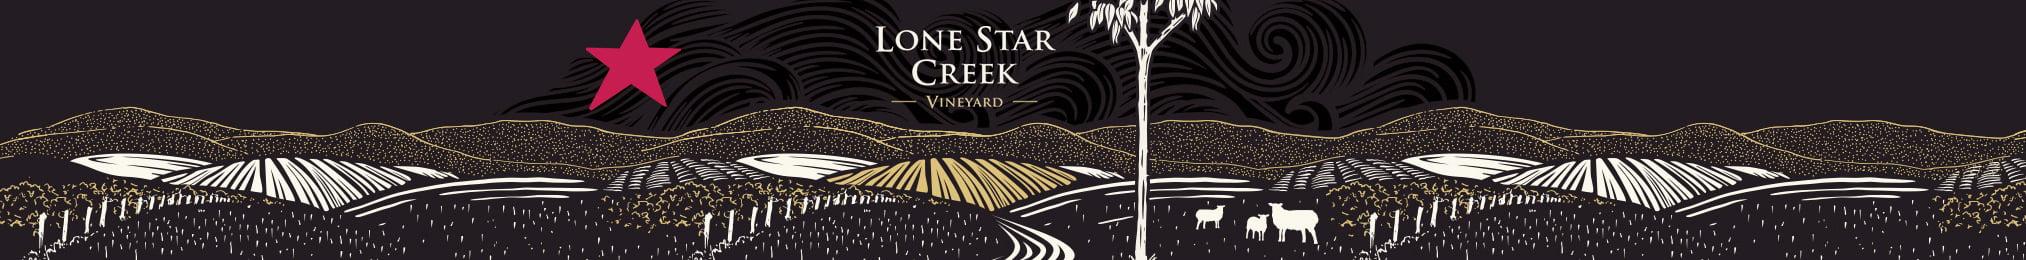 Lone Star Creek logo